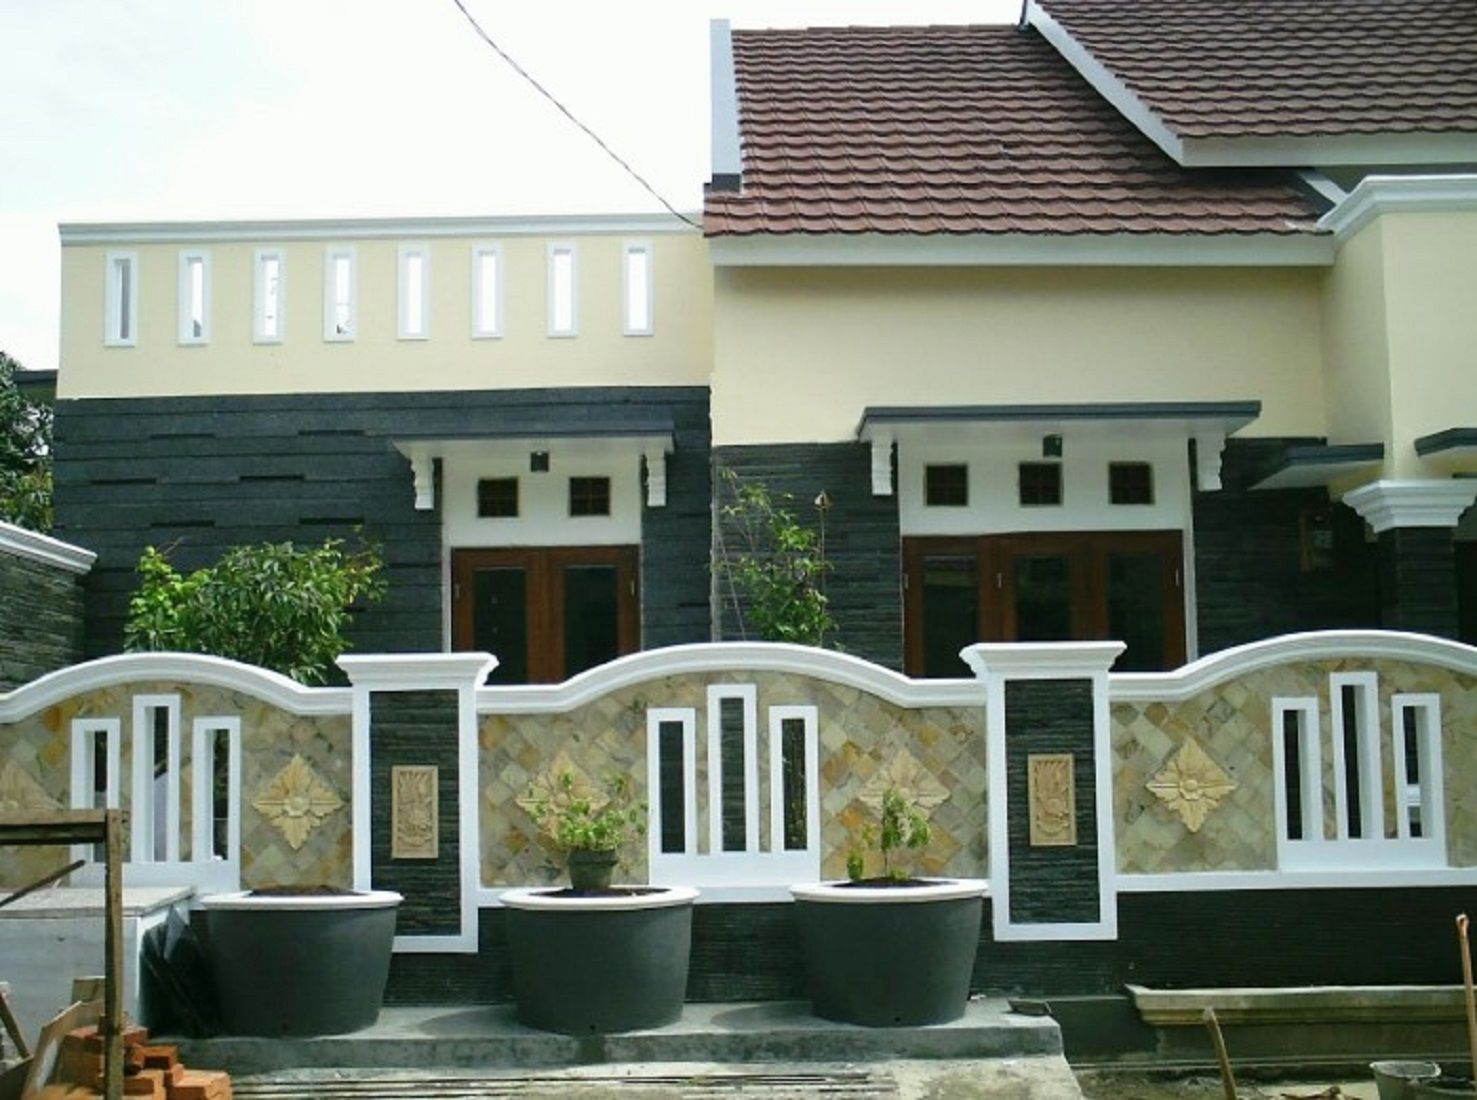 60 Model Pagar Rumah Minimalis Besi Dan Kayu Modern